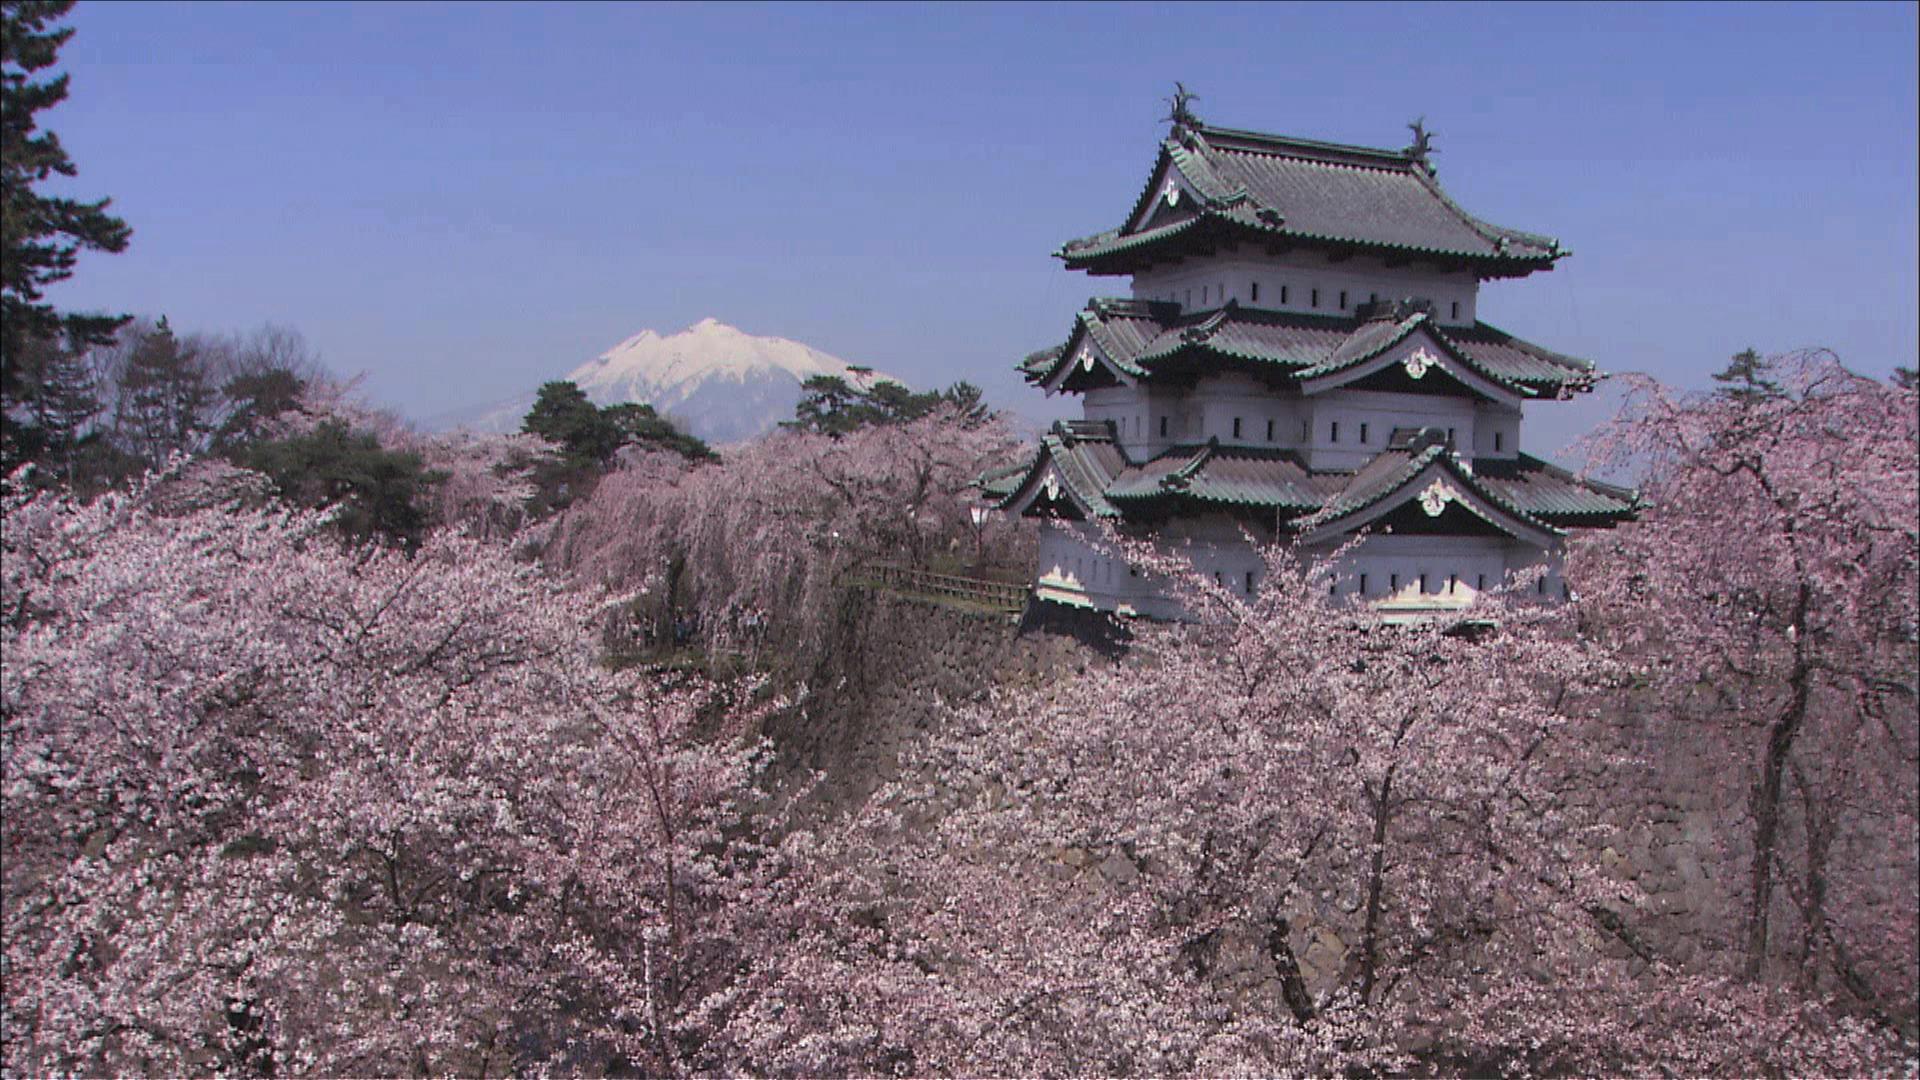 Hirosaki Aomori For Beautiful Cherry Blossoms In Japan Deepjapan